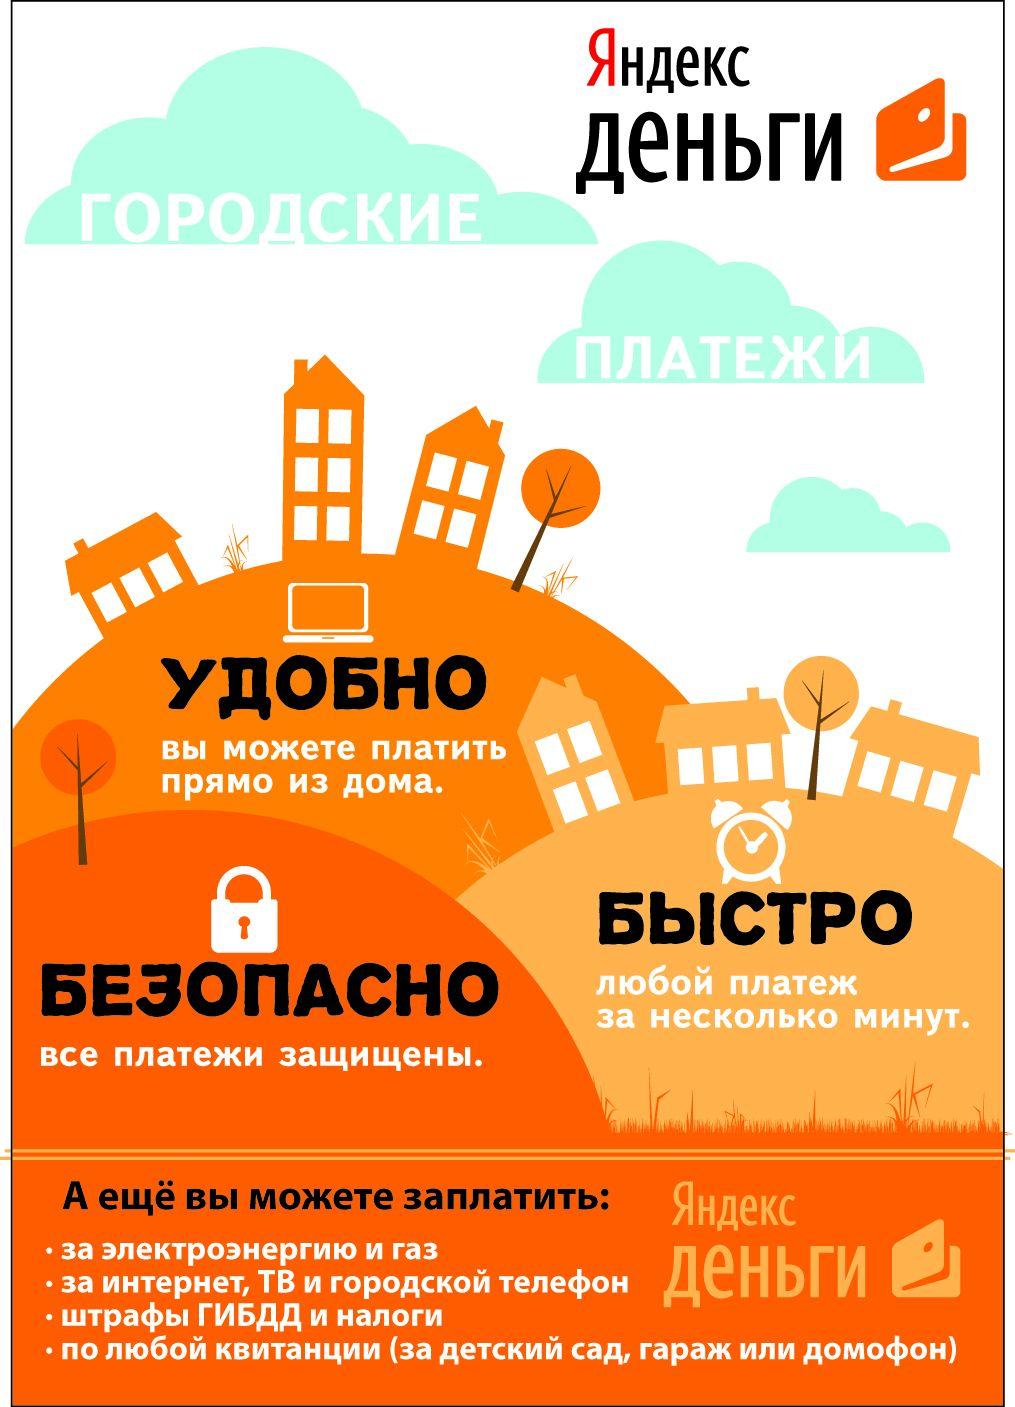 Реклама Яндекс.Денег для оплаты ЖКХ - дизайнер mariasha01